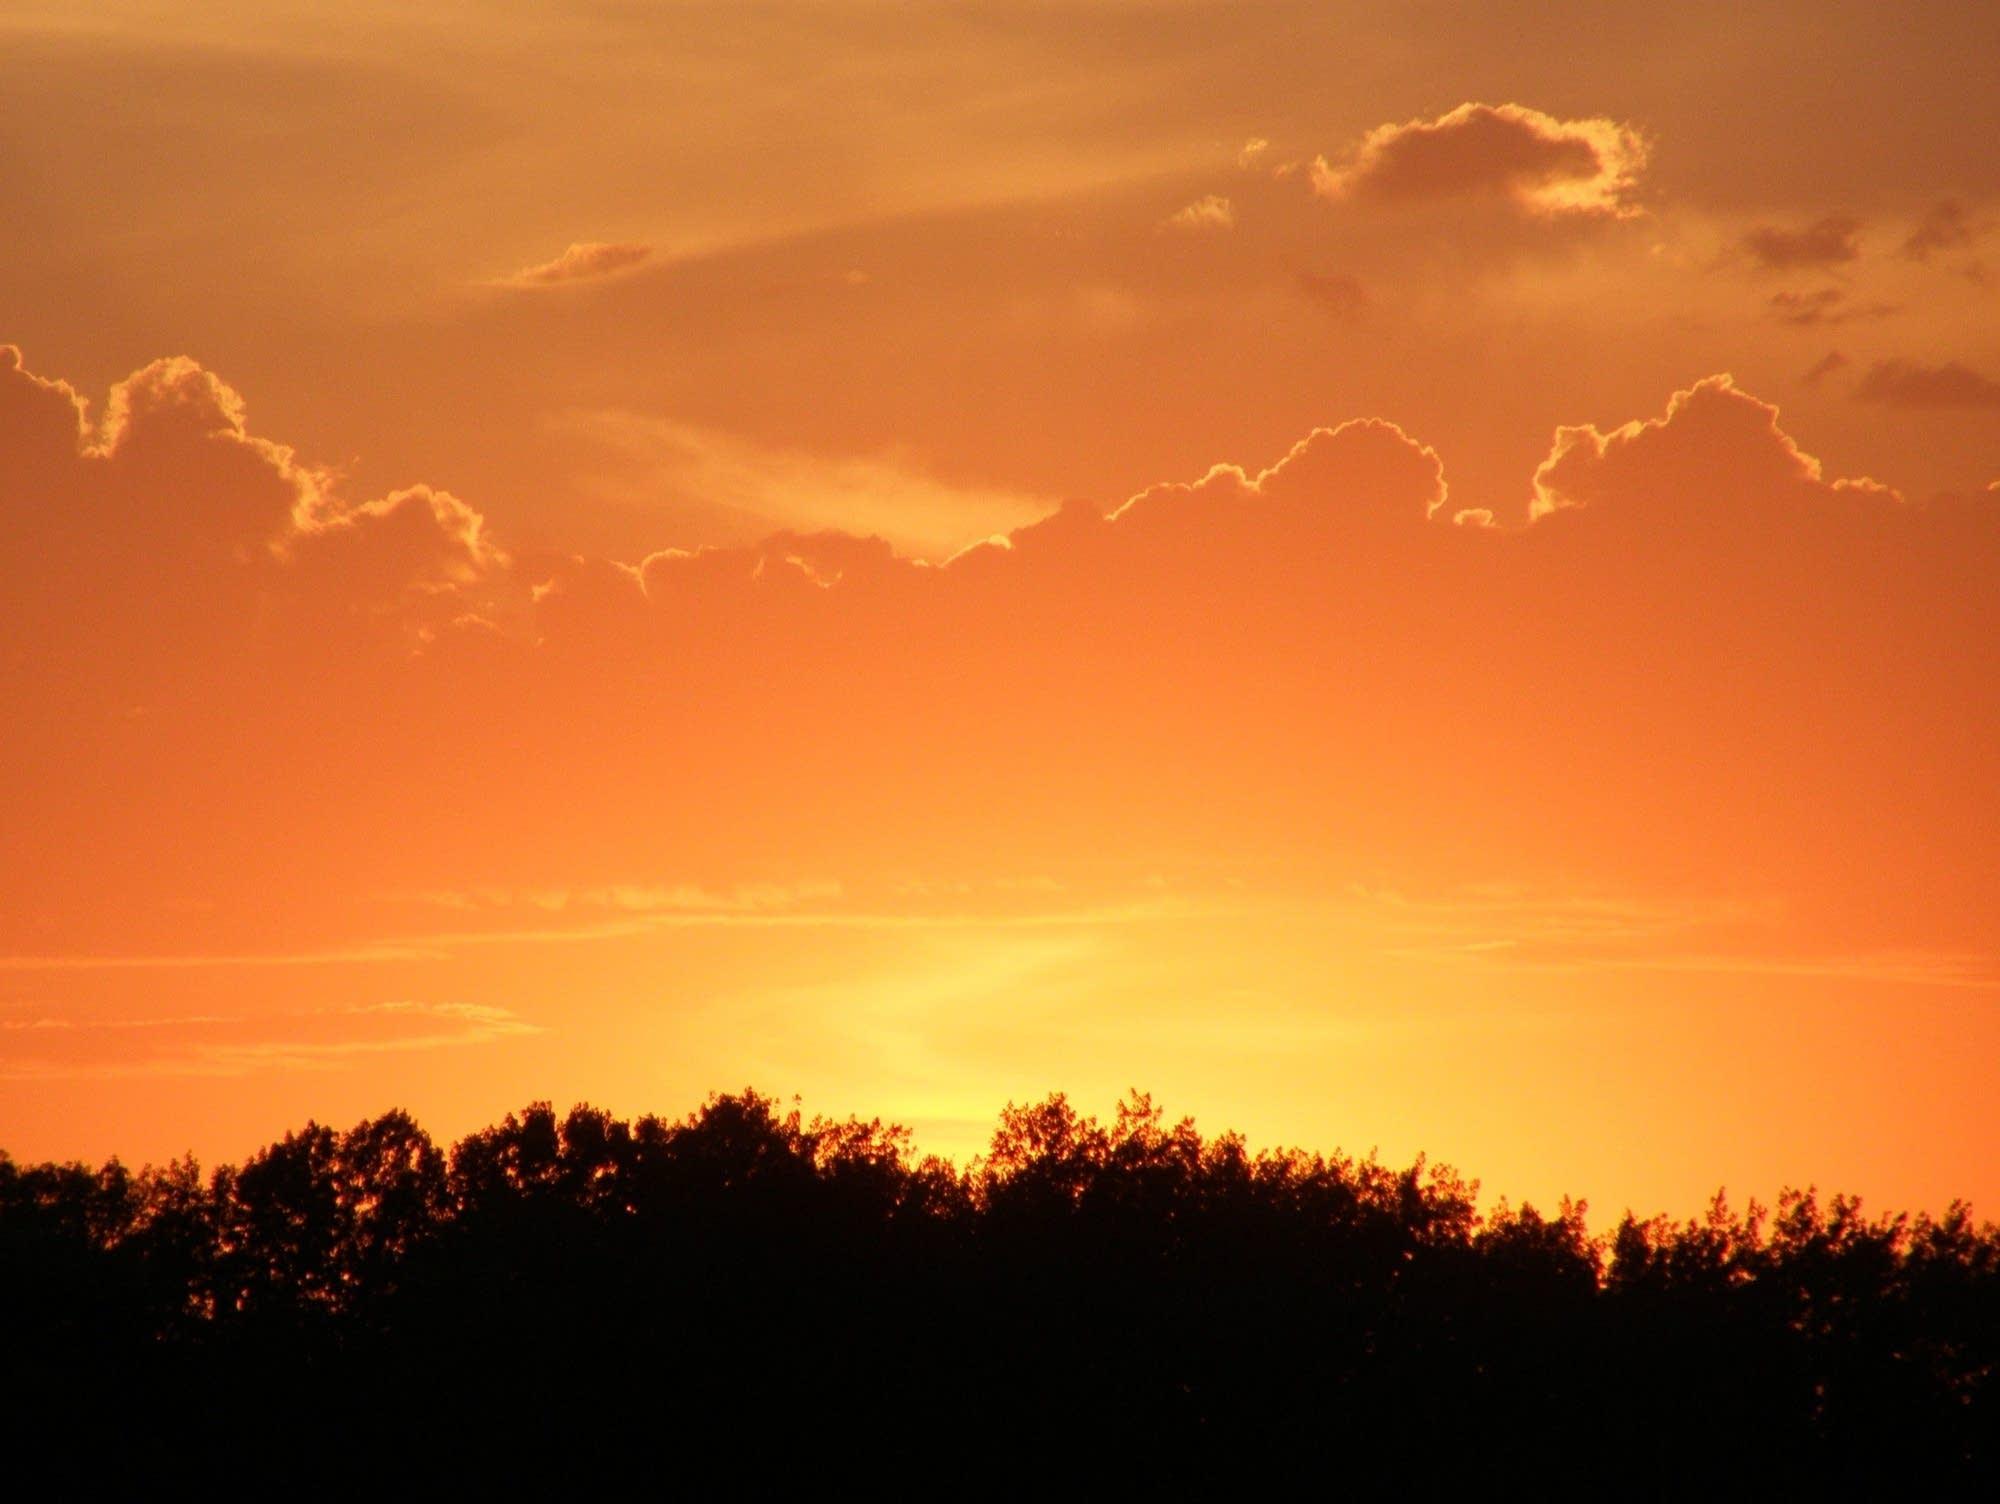 A Minnesota sunset